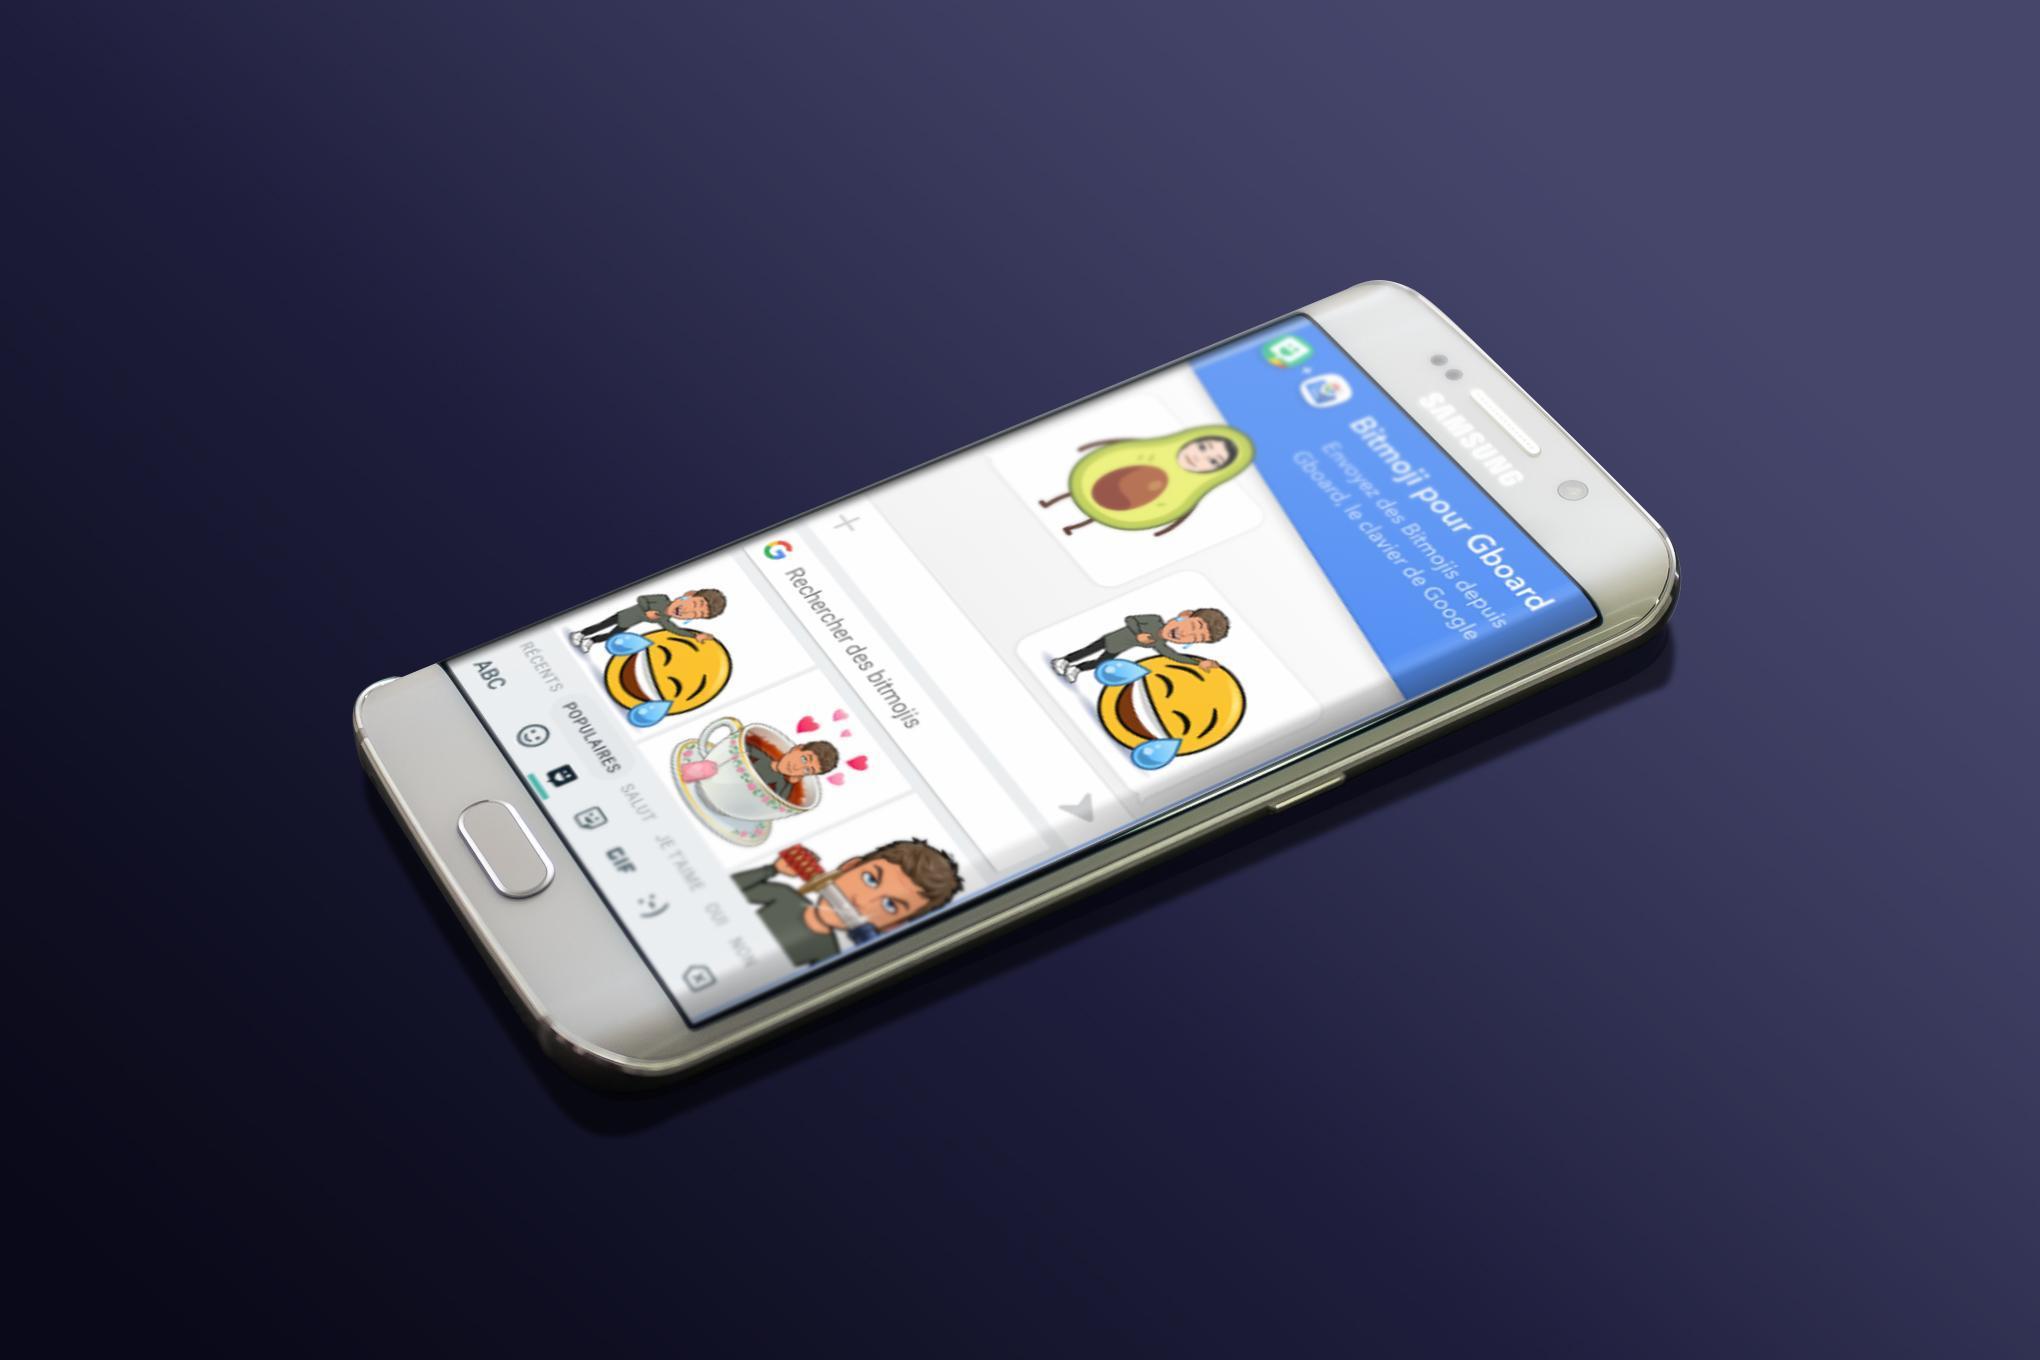 free Kik Messenger : kk users & live calls for Android - APK Download